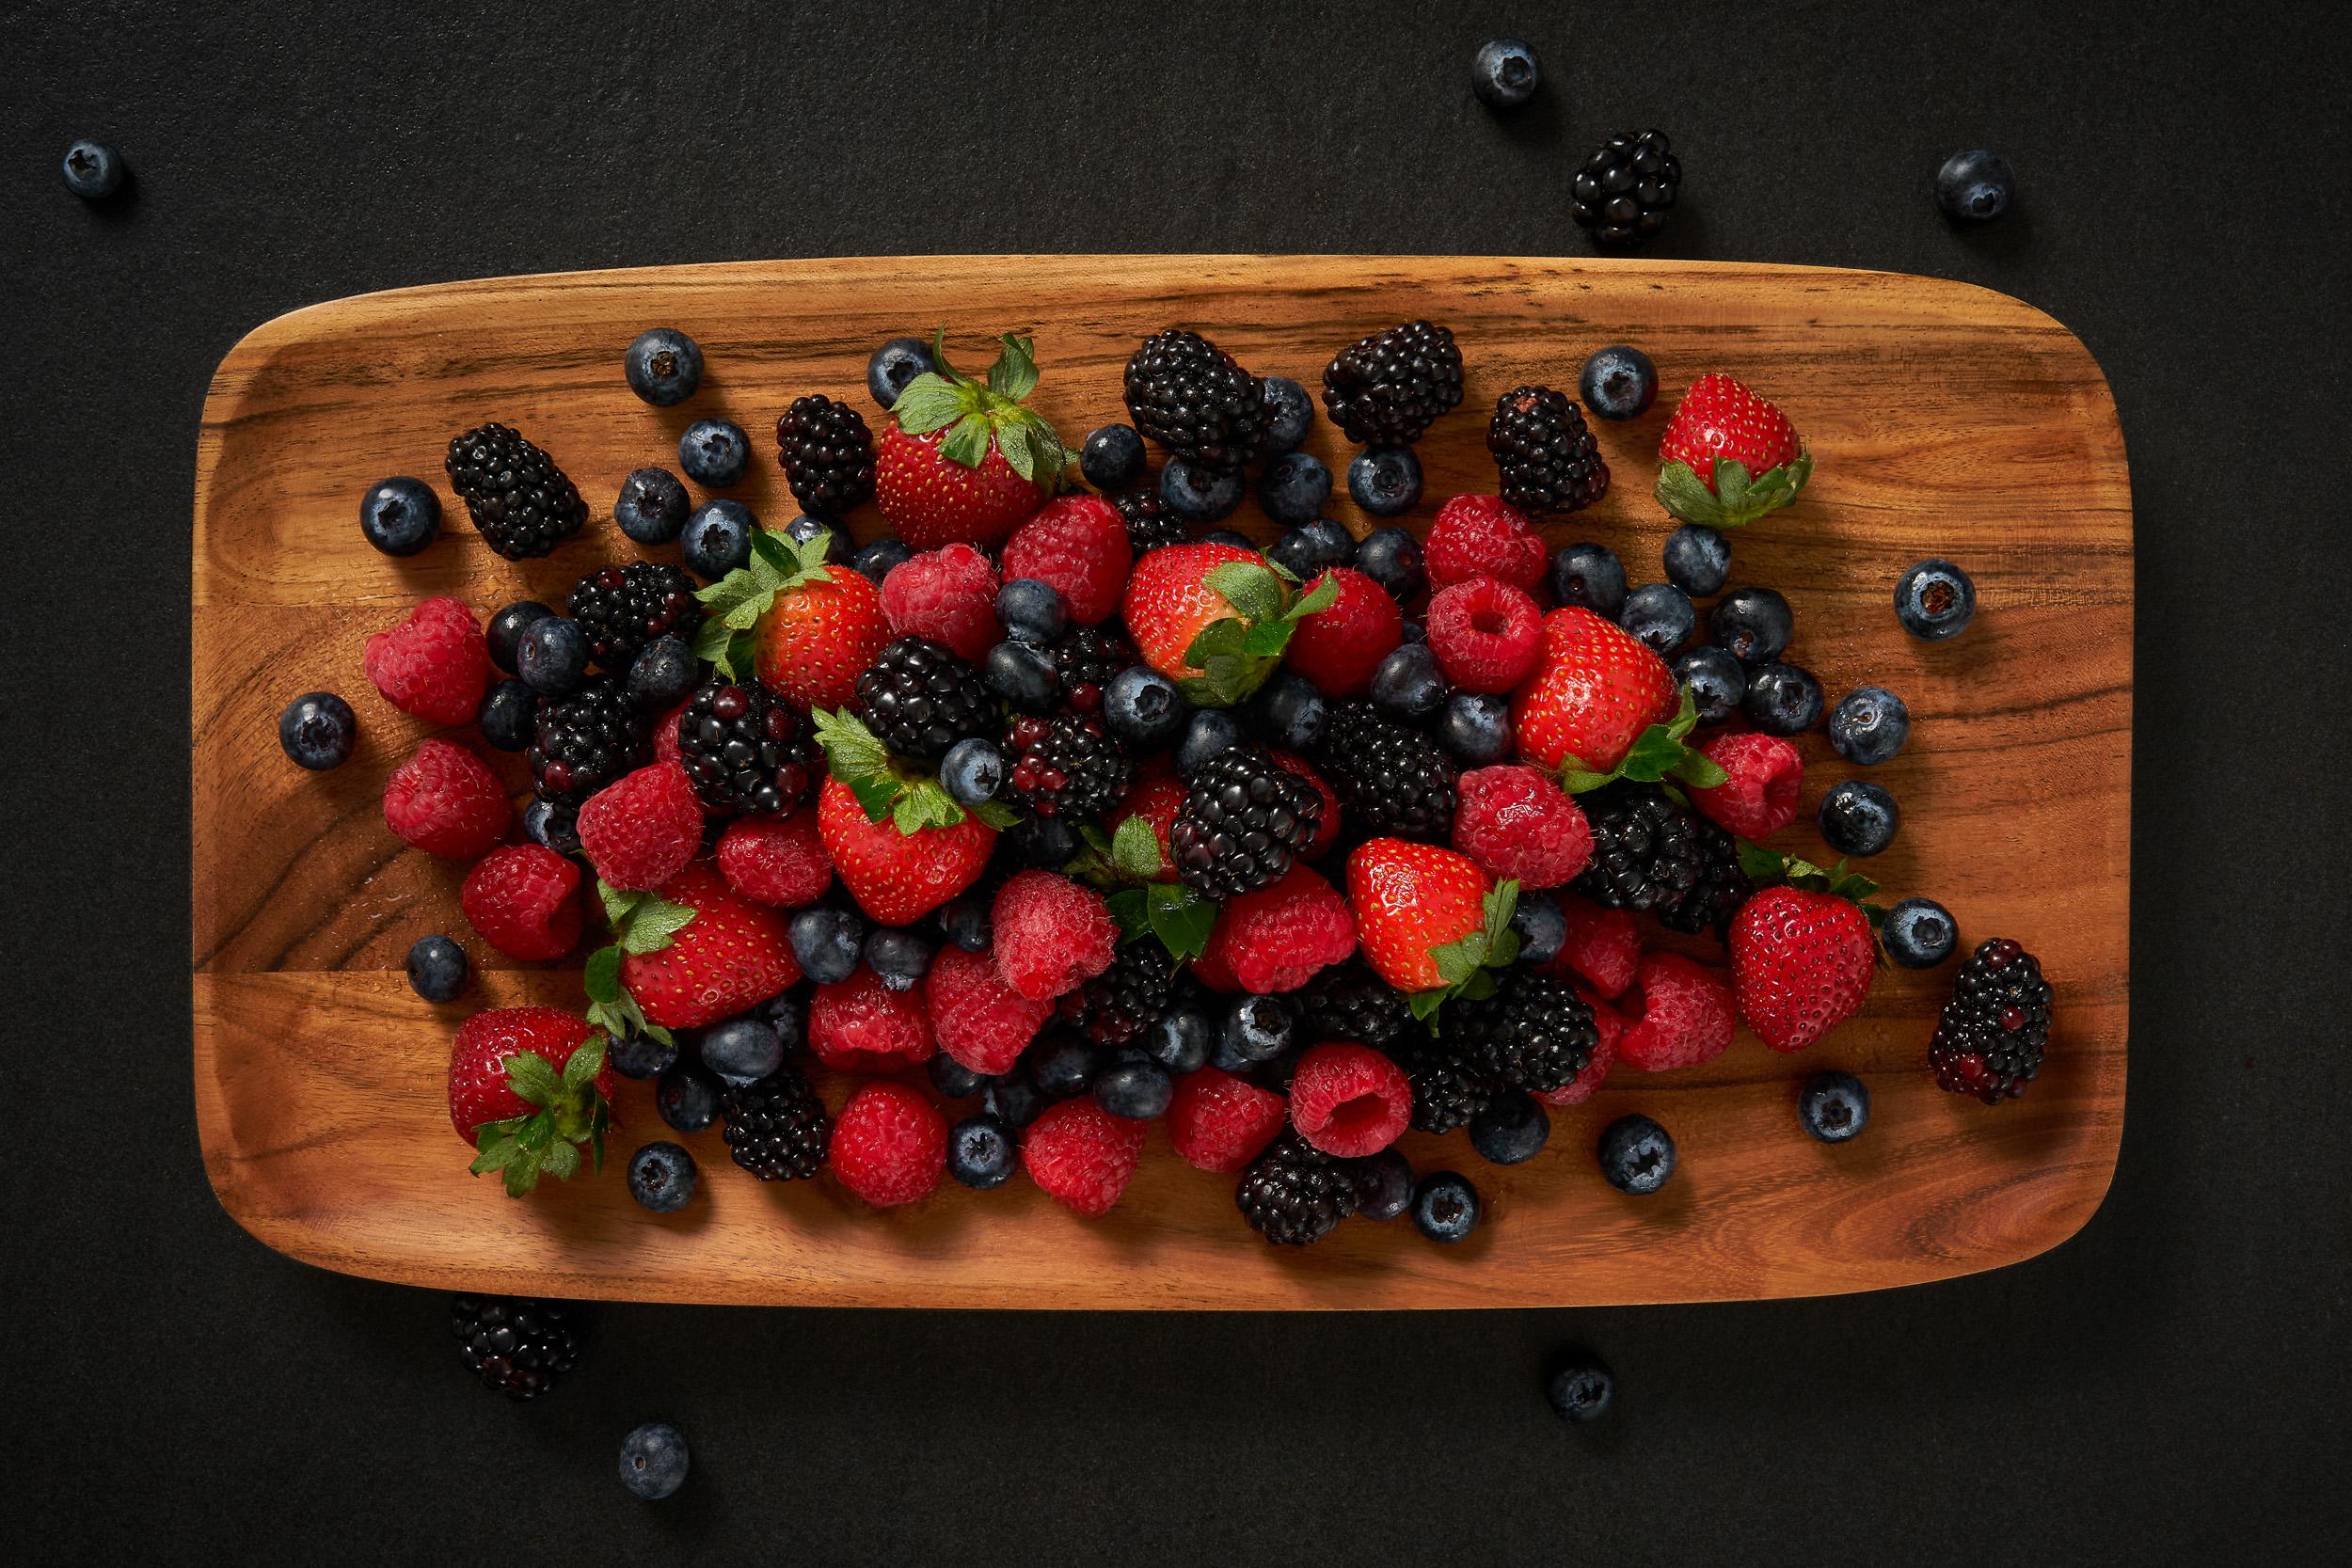 Wild_Berries_Miami_Food_Photographer-00599-Edit.jpg